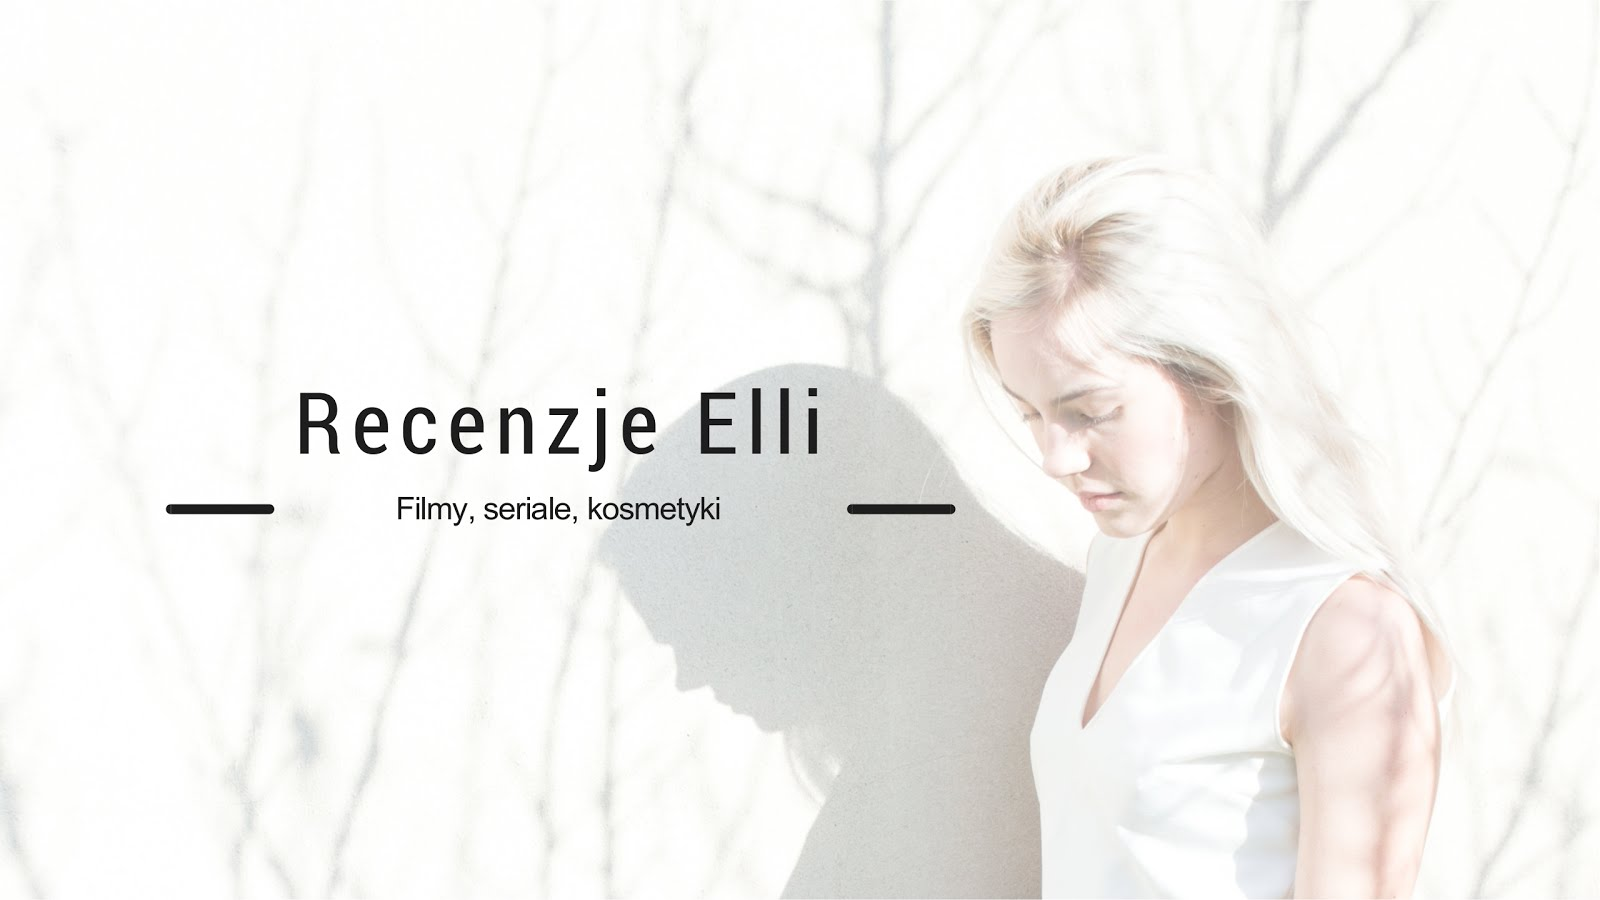 Recenzje Elli